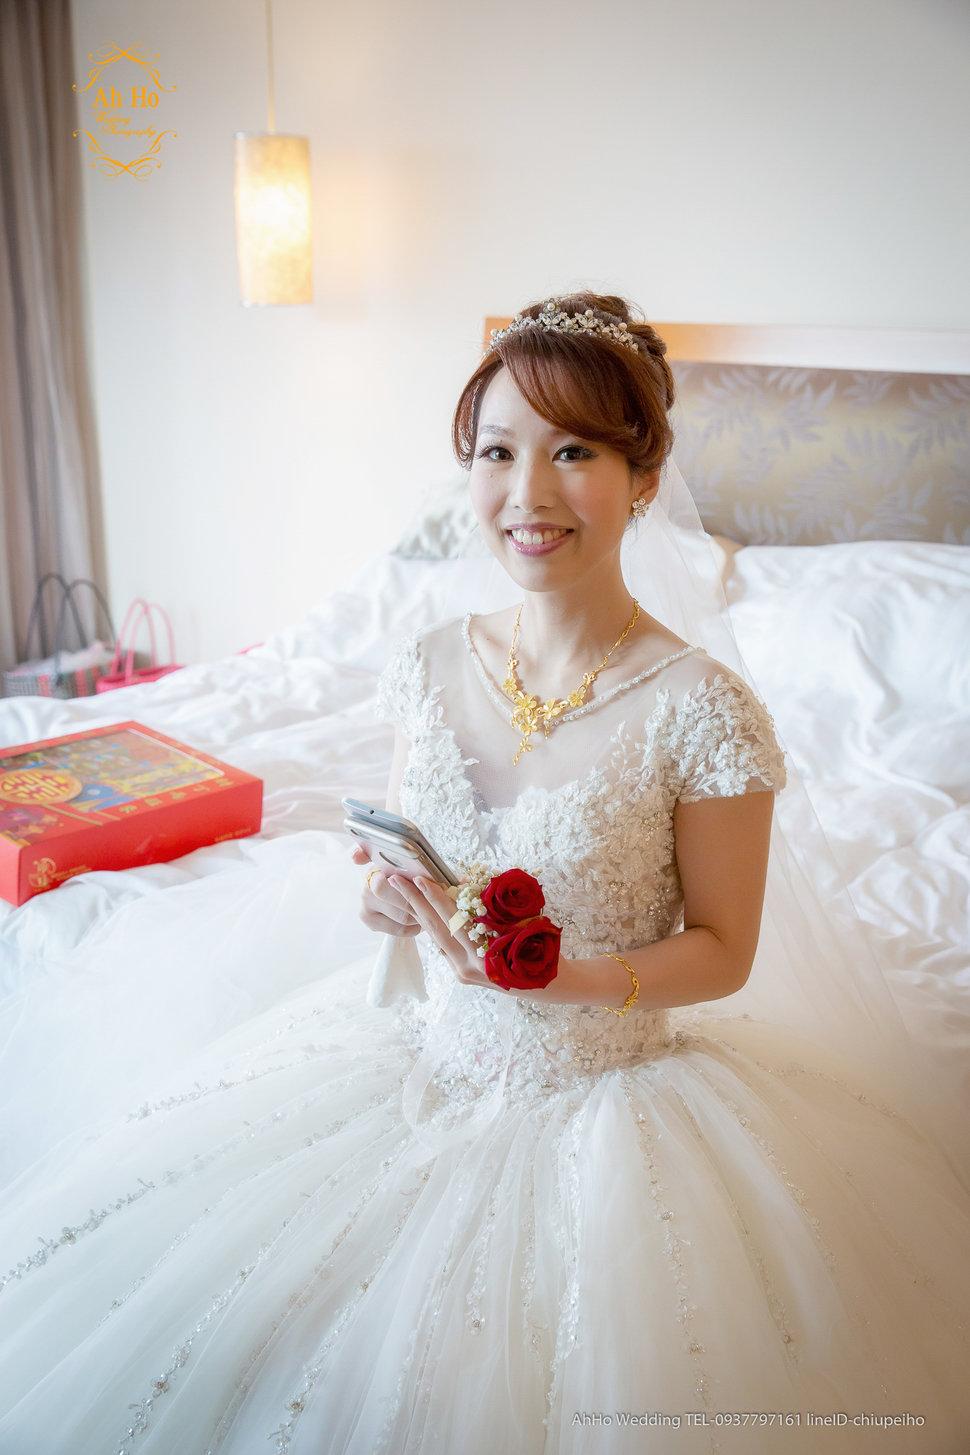 AhHo Wedding TEL-0937797161 lineID-chiupeiho (45 - 220) - AhHoWedding/阿河婚攝《結婚吧》